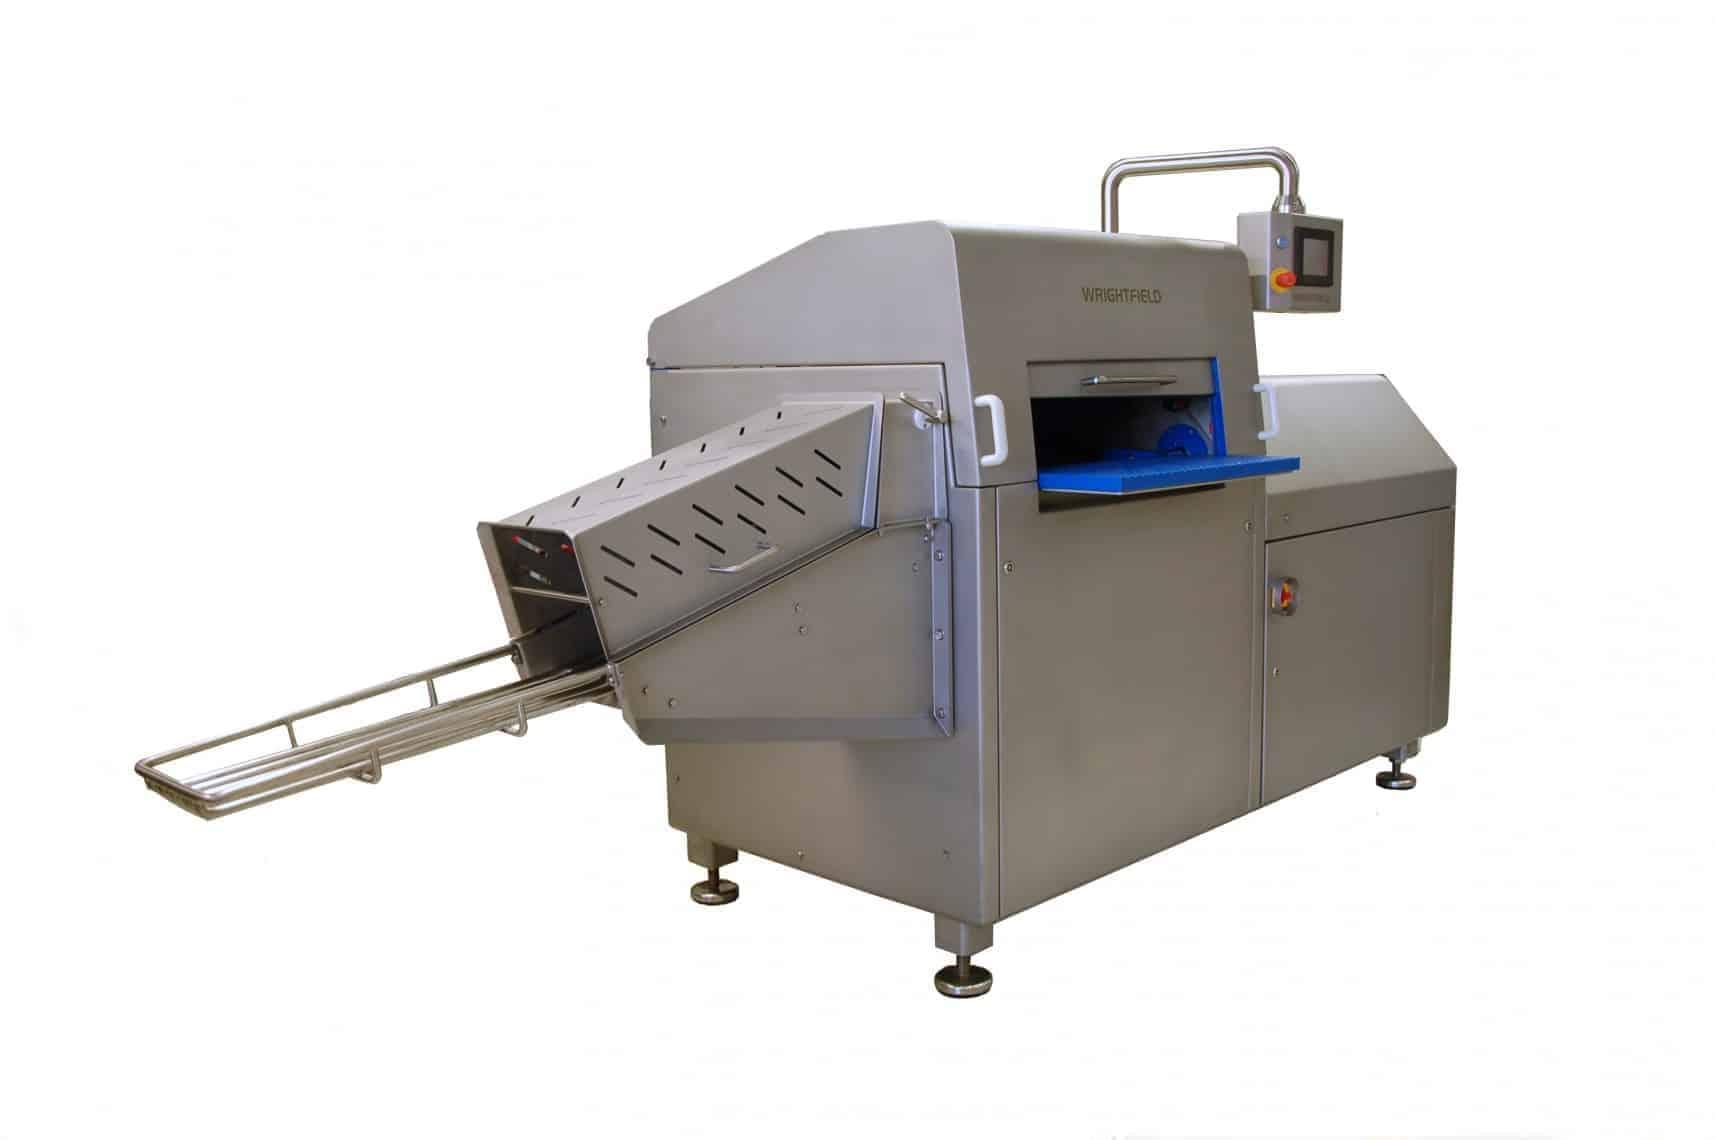 Meat Press Meat Processing Equipment Meatpress From Wrighfield Ltd